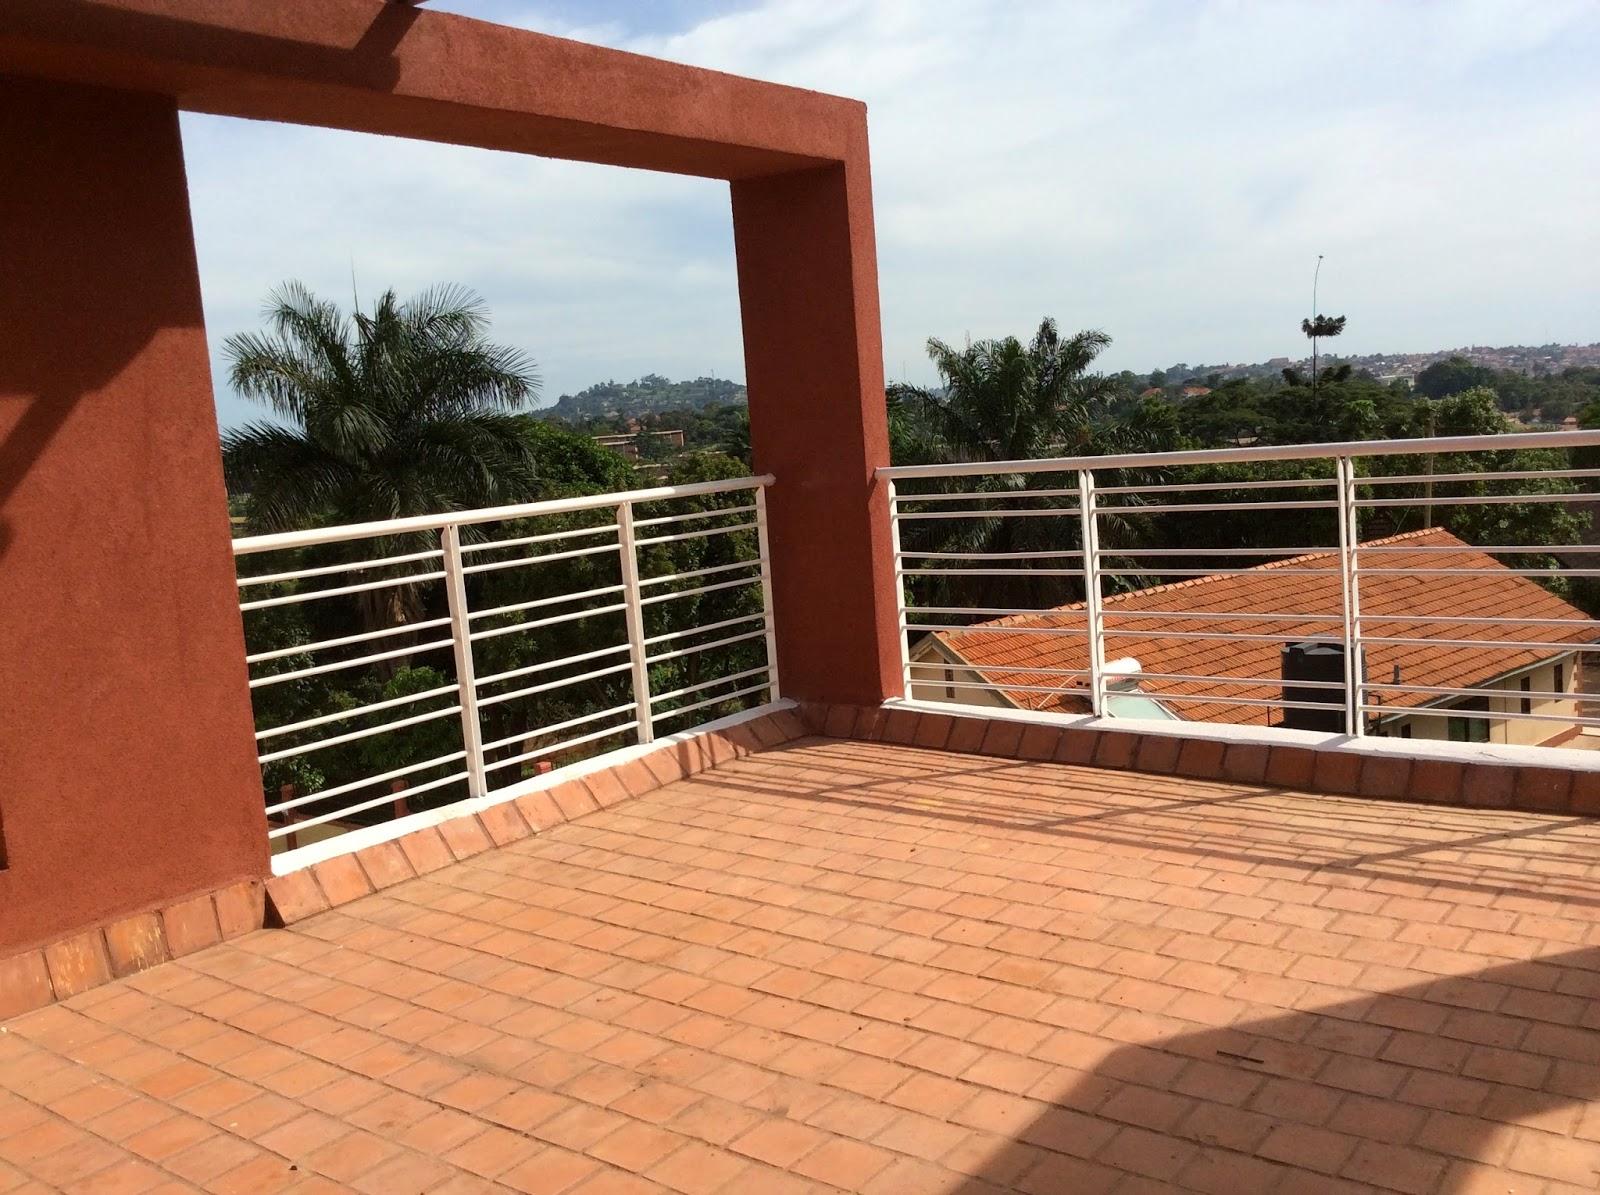 Newly built townhouses for rent mbuya kampala uganda